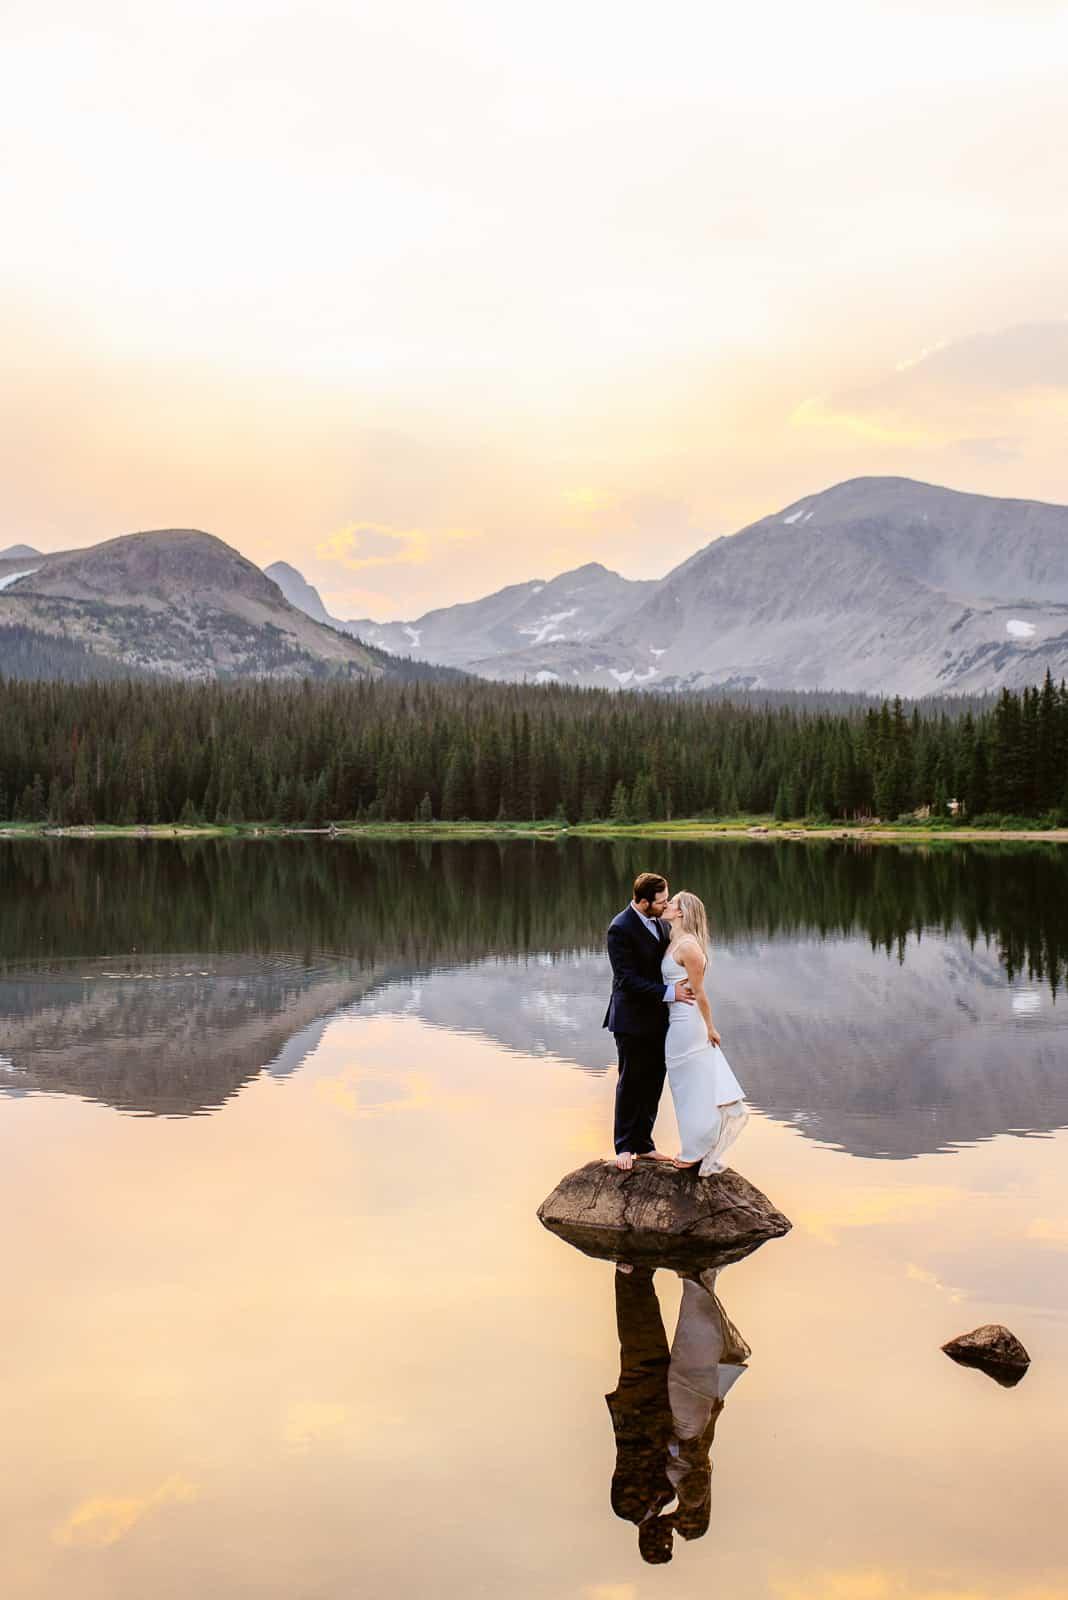 Colorado destination elopement ideas | Josie V Photography